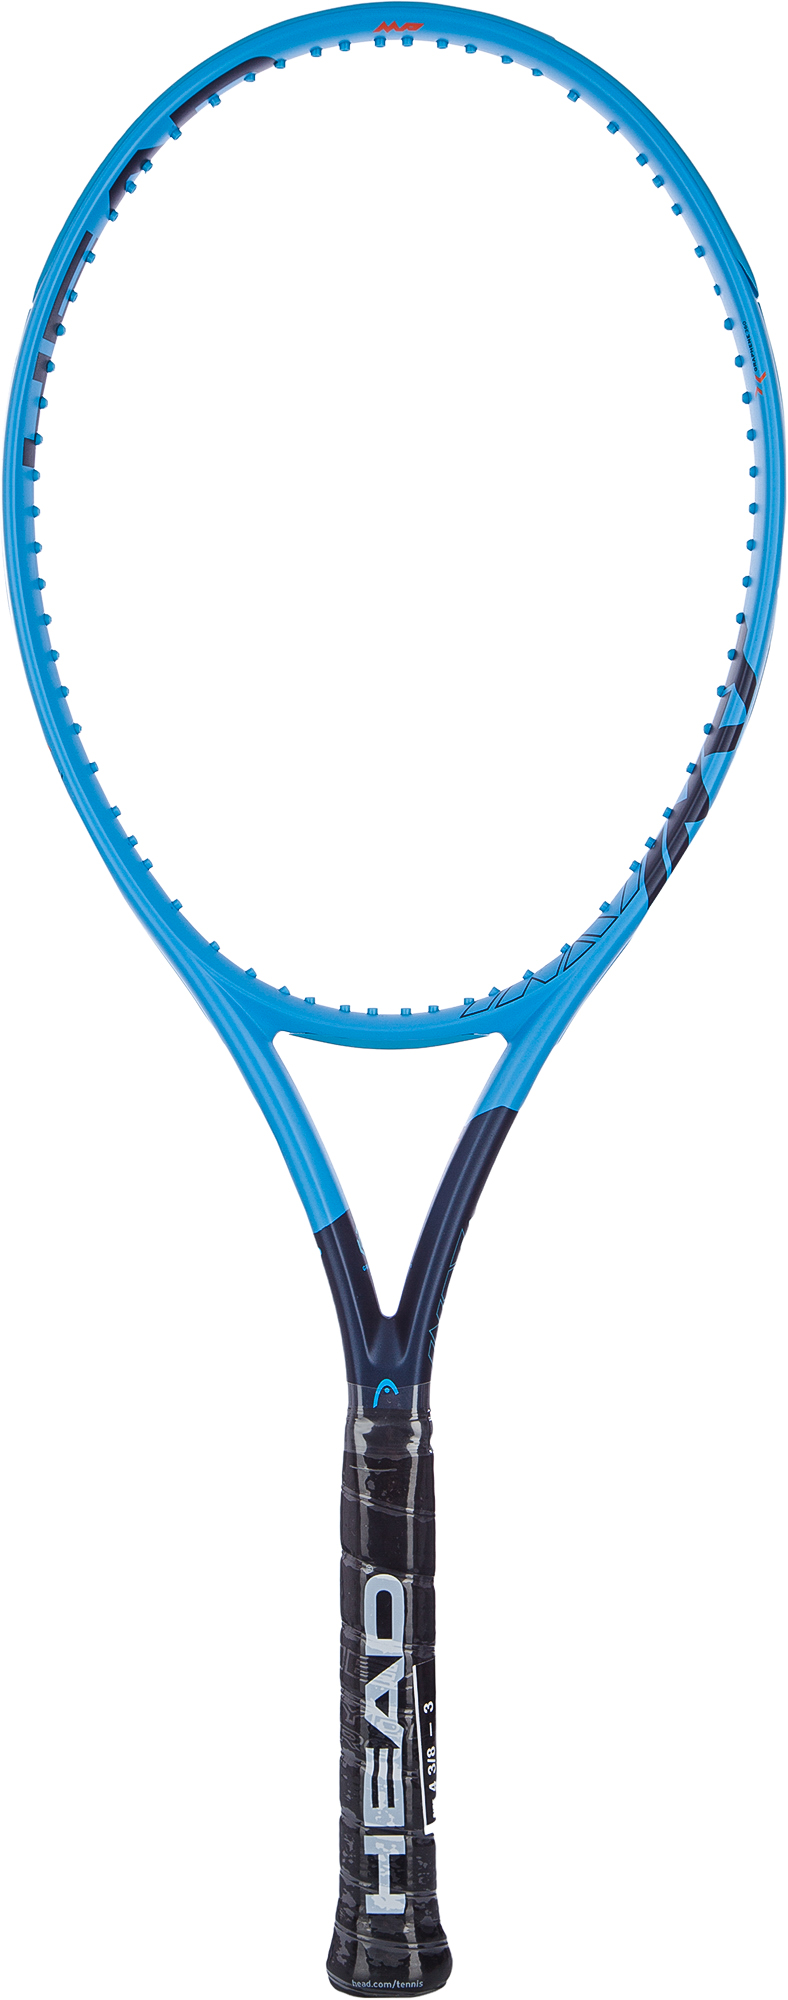 Head Ракетка для большого тенниса Head Graphene 360 Instinct MP 27 head ракетка для большого тенниса head graphene 360 speed lite 27